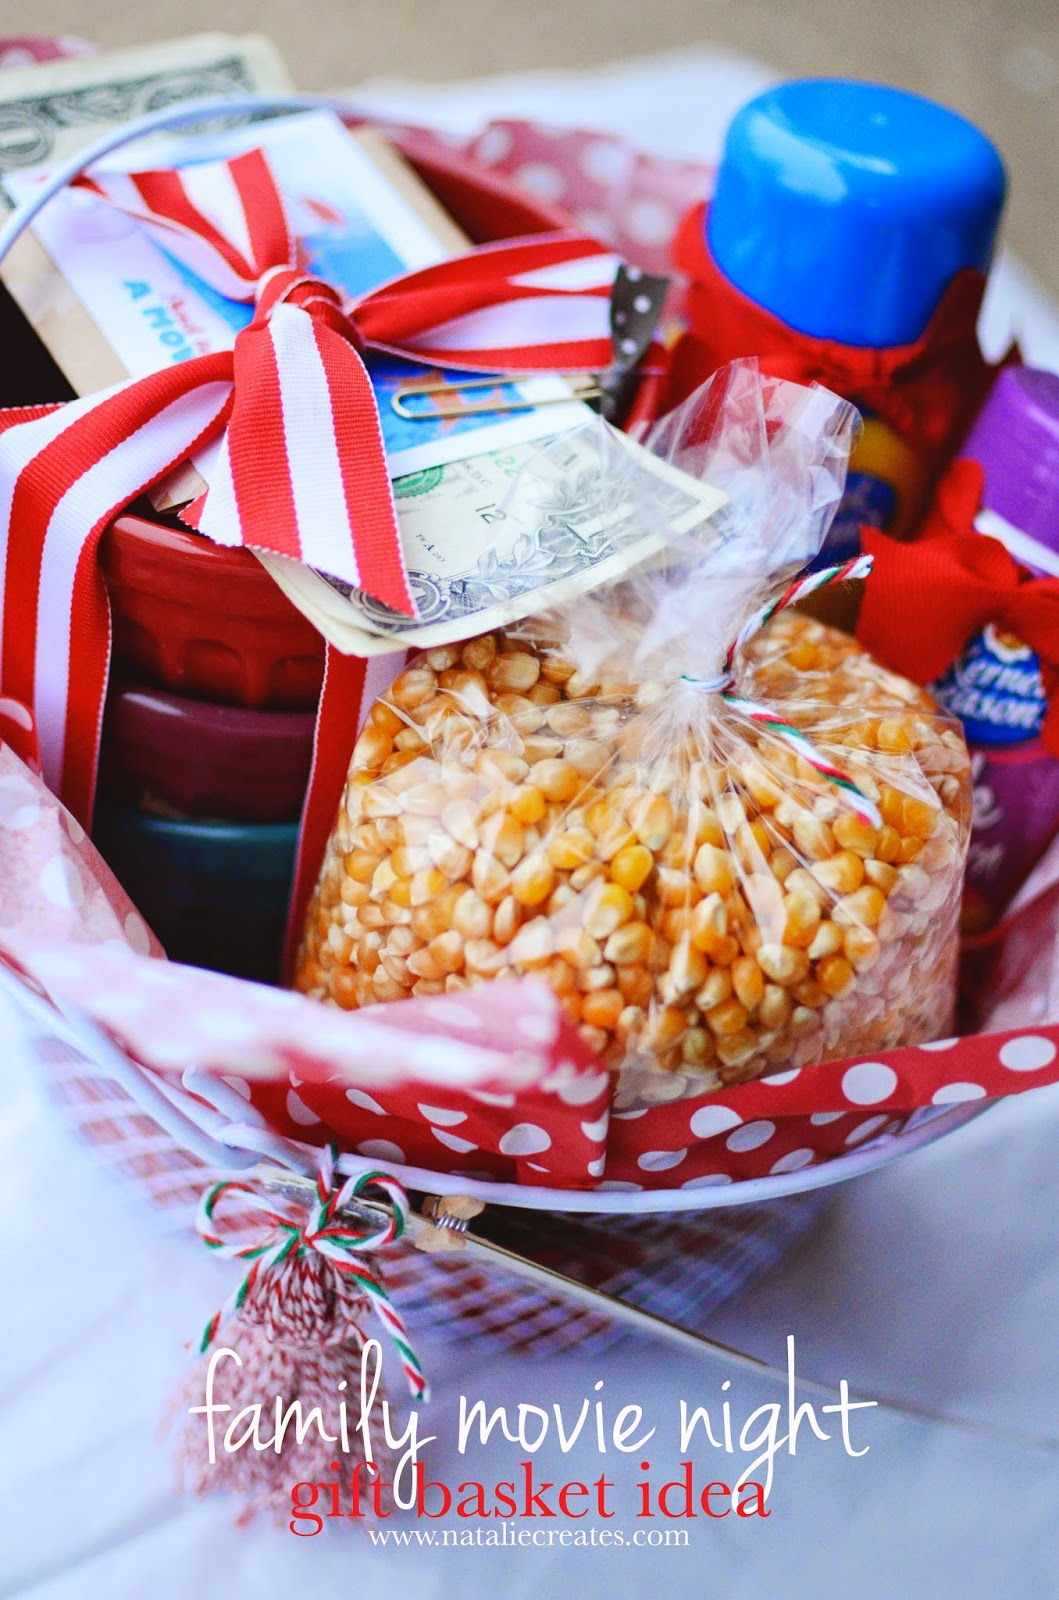 natalie creates: family movie night gift basket idea